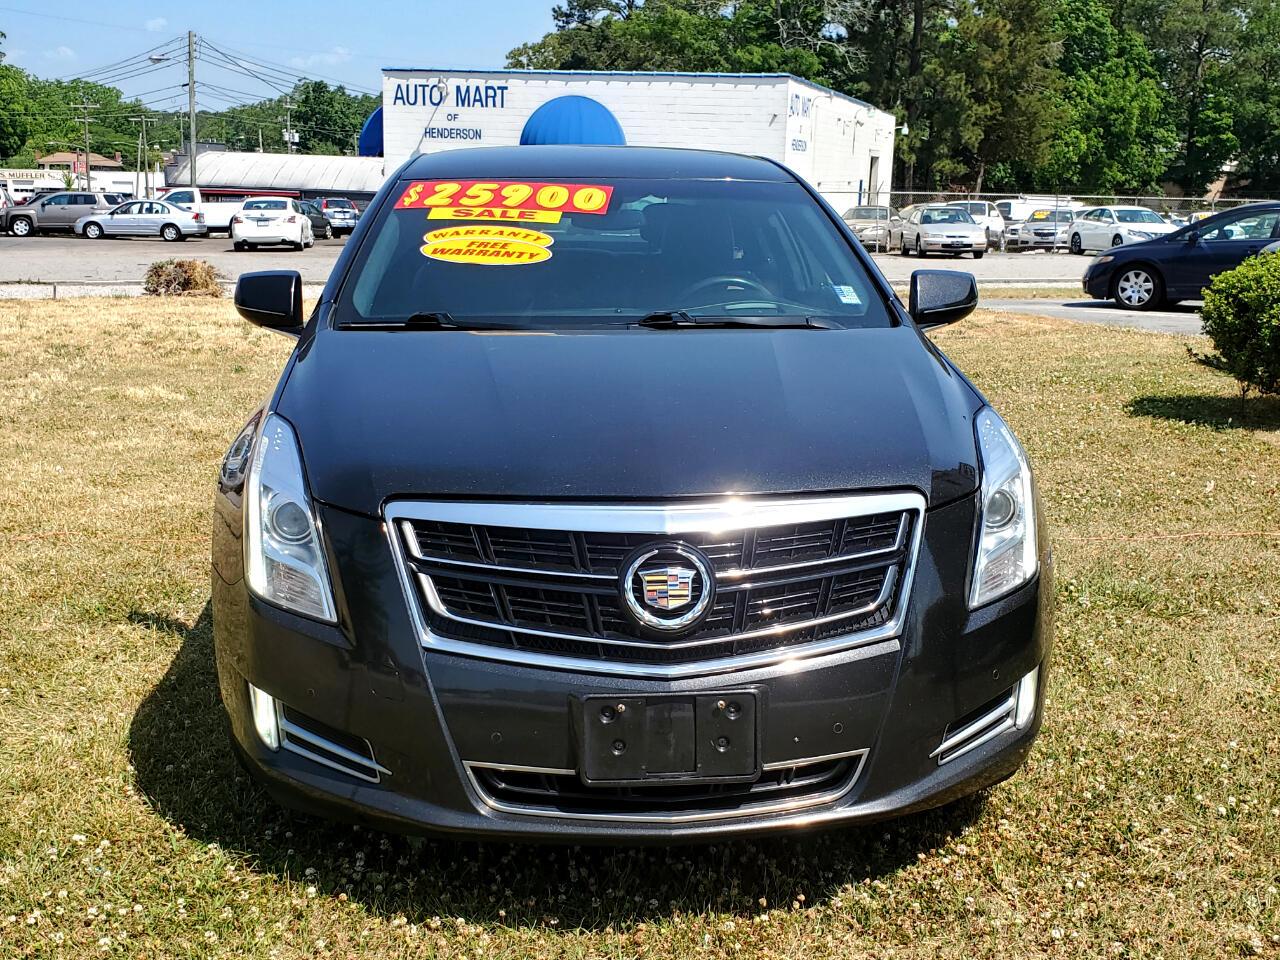 Cadillac XTS 4dr Sdn Vsport Premium AWD 2015